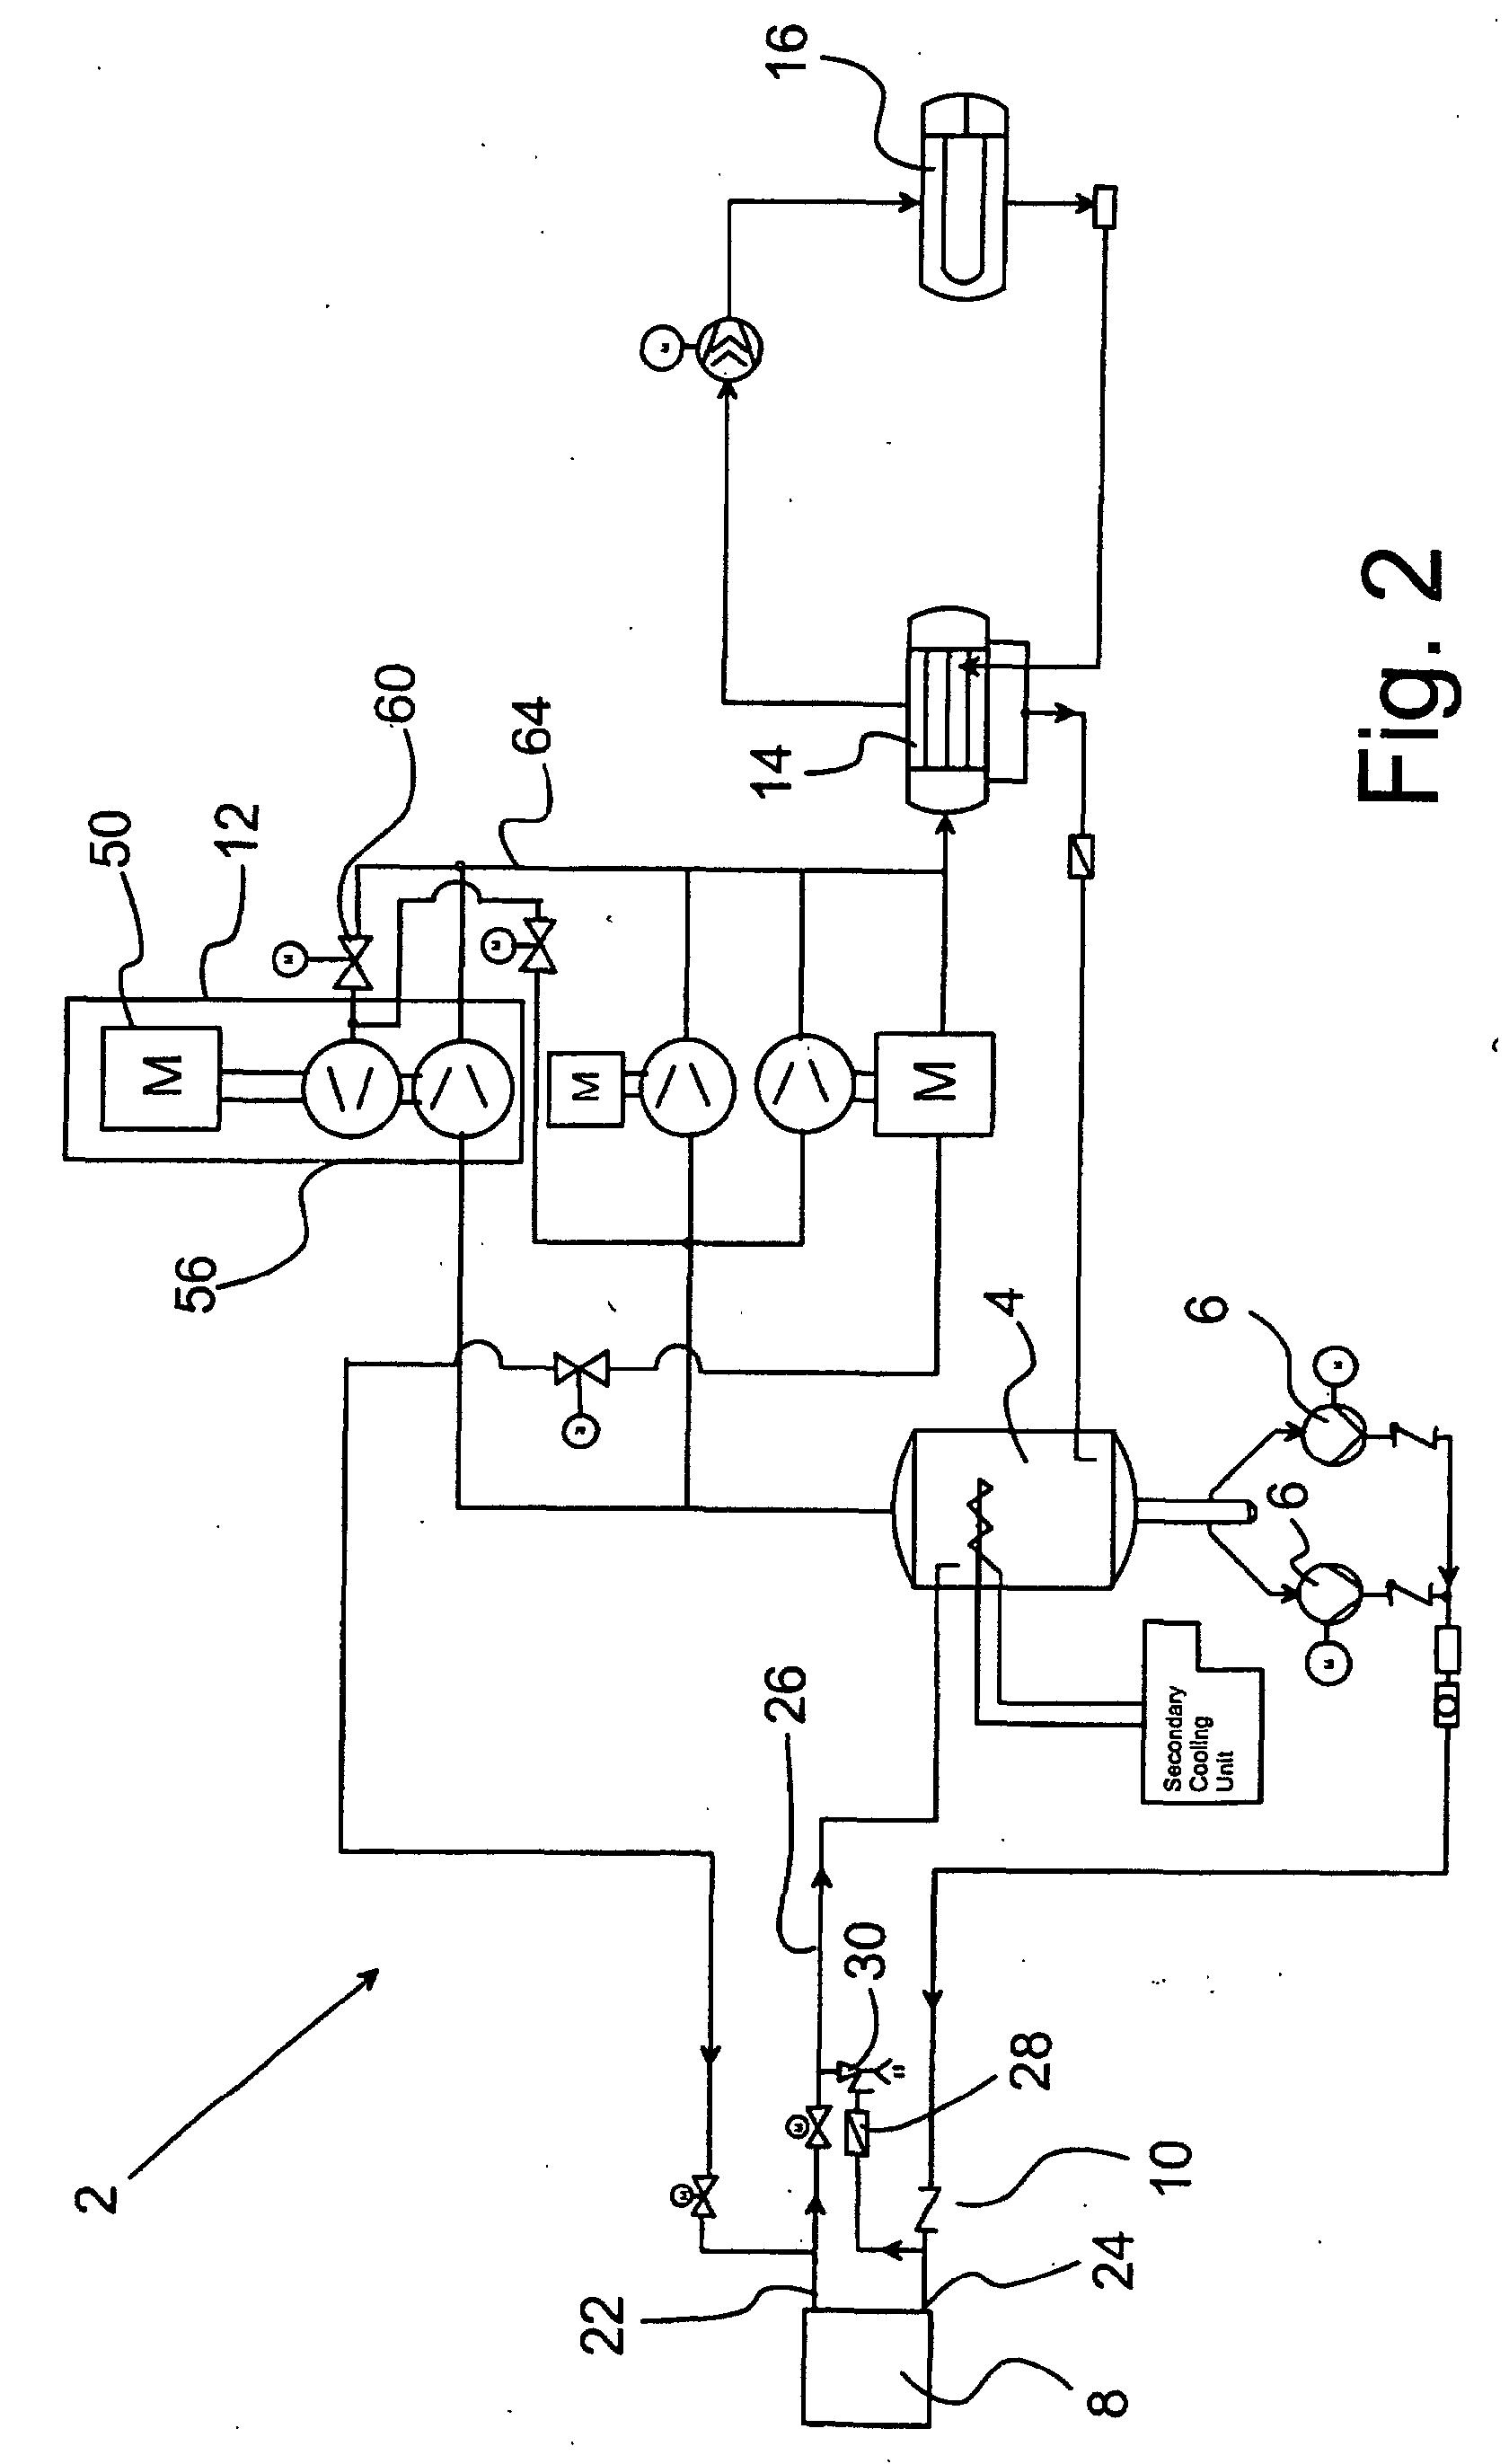 Heatcraft Unit Cooler Wiring Diagram